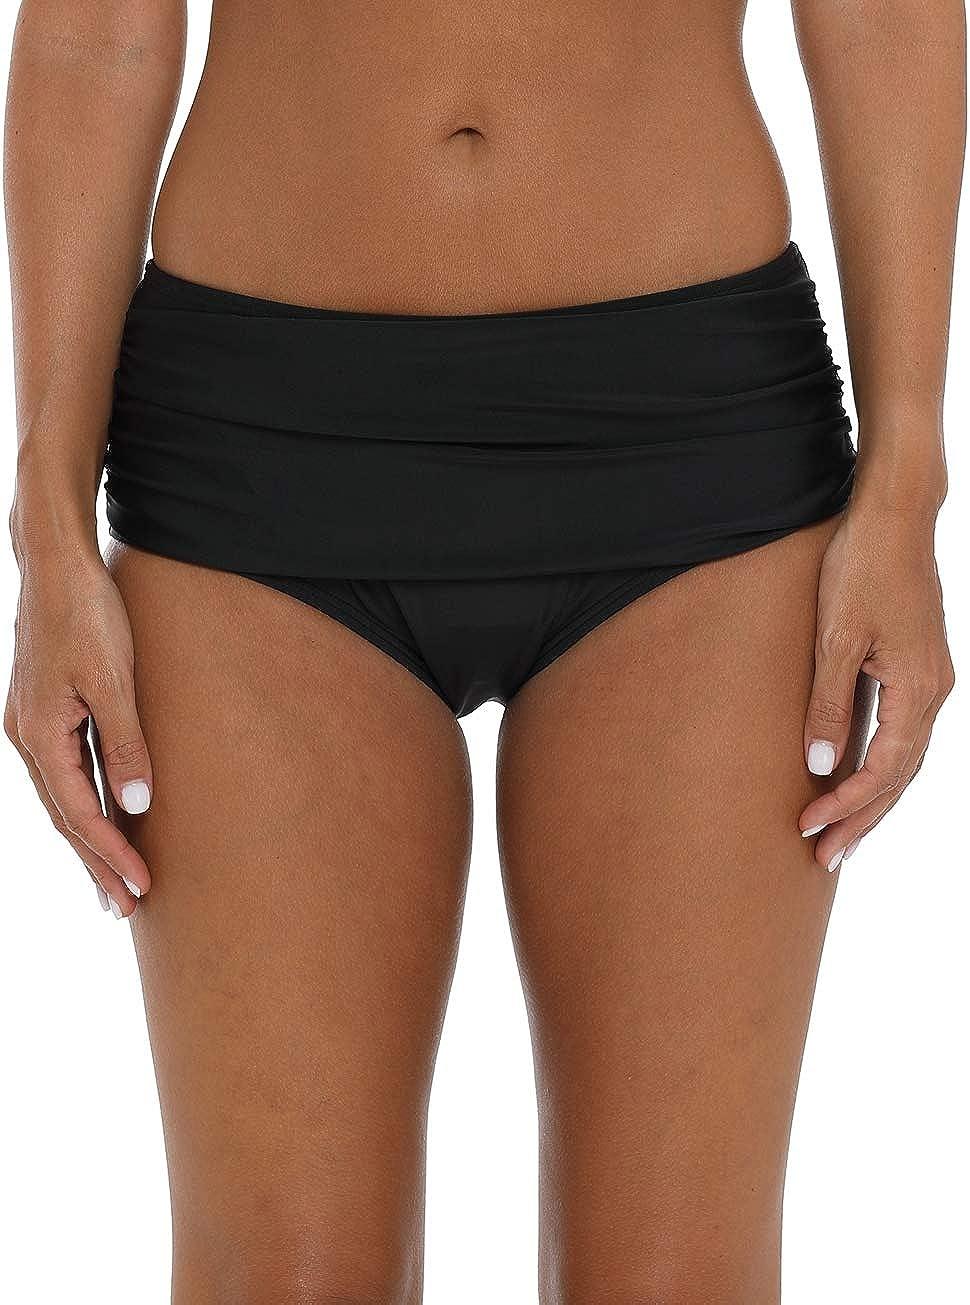 ATTRACO Womens Bikini Bottoms Swim Bottoms Adjustable Side Tie Bathing Suits